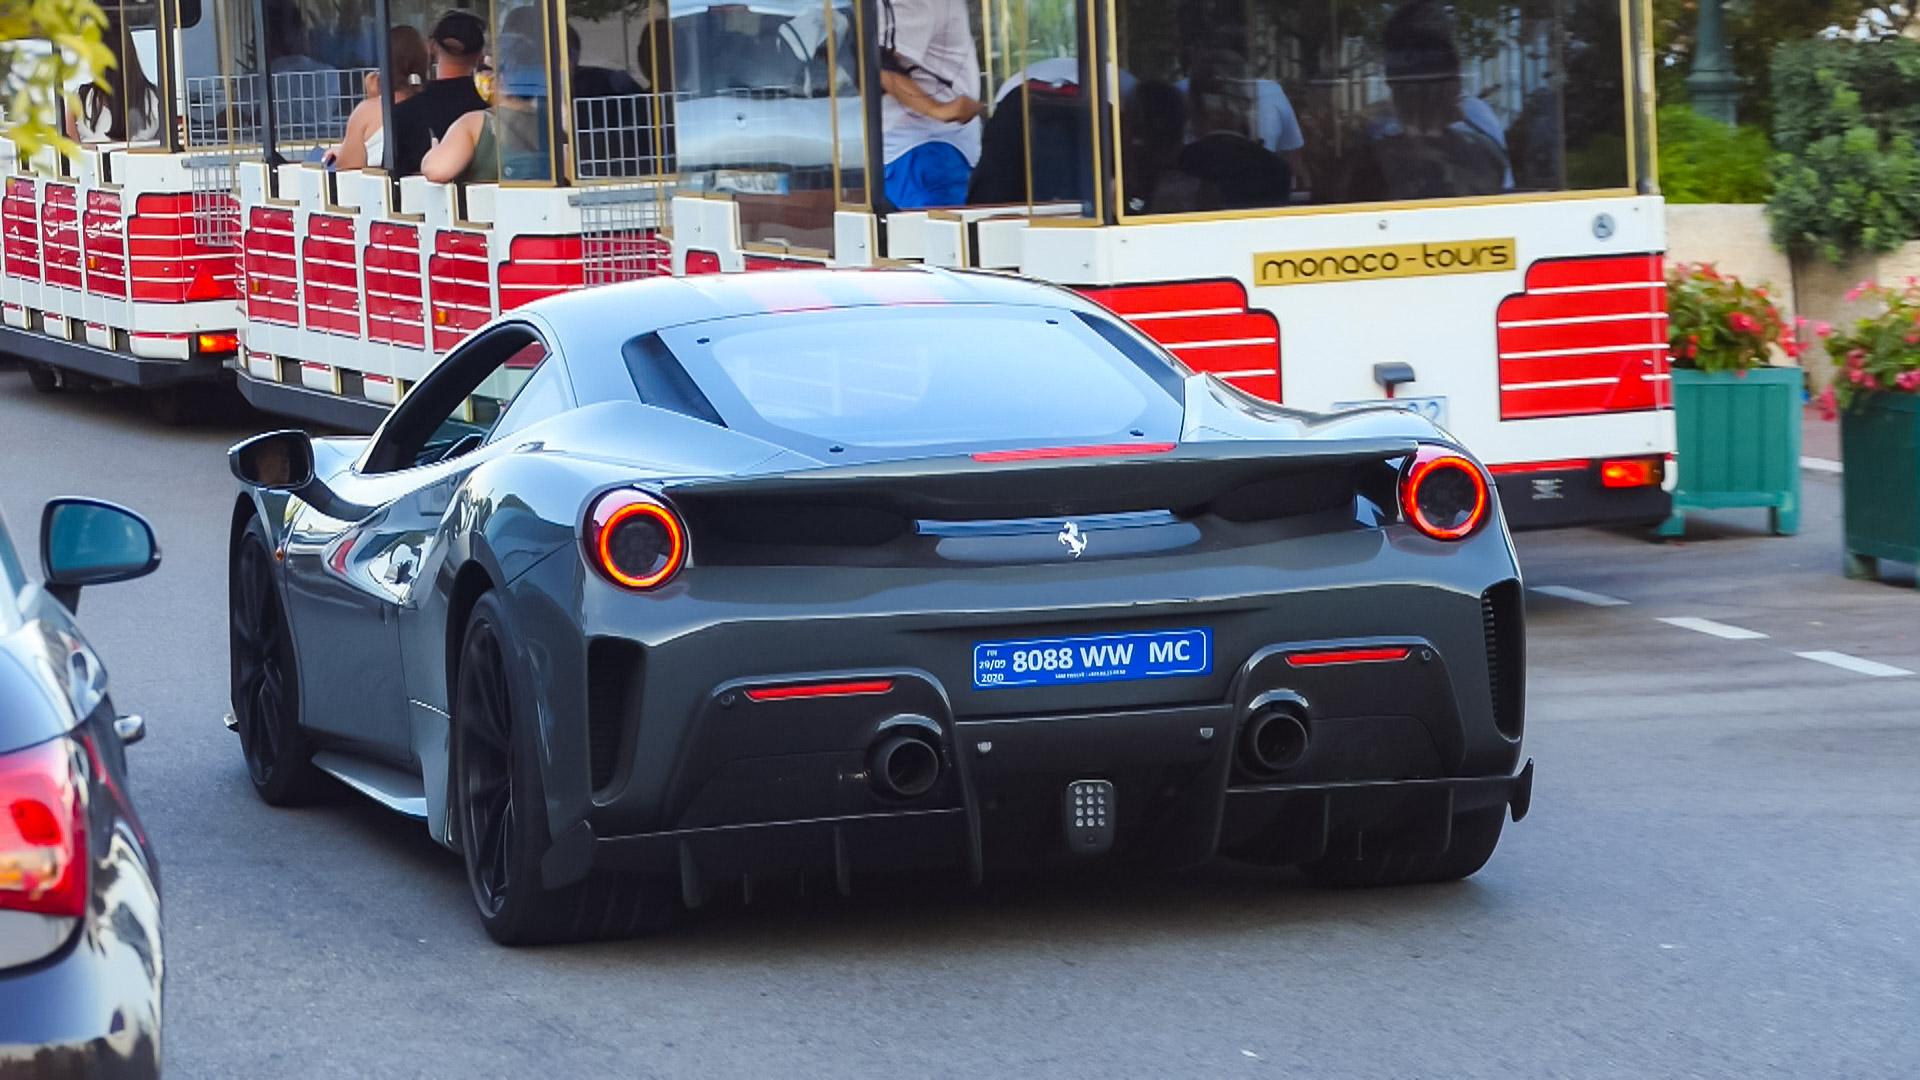 Ferrari 488 Pista - 8088-WW-MC (MC)